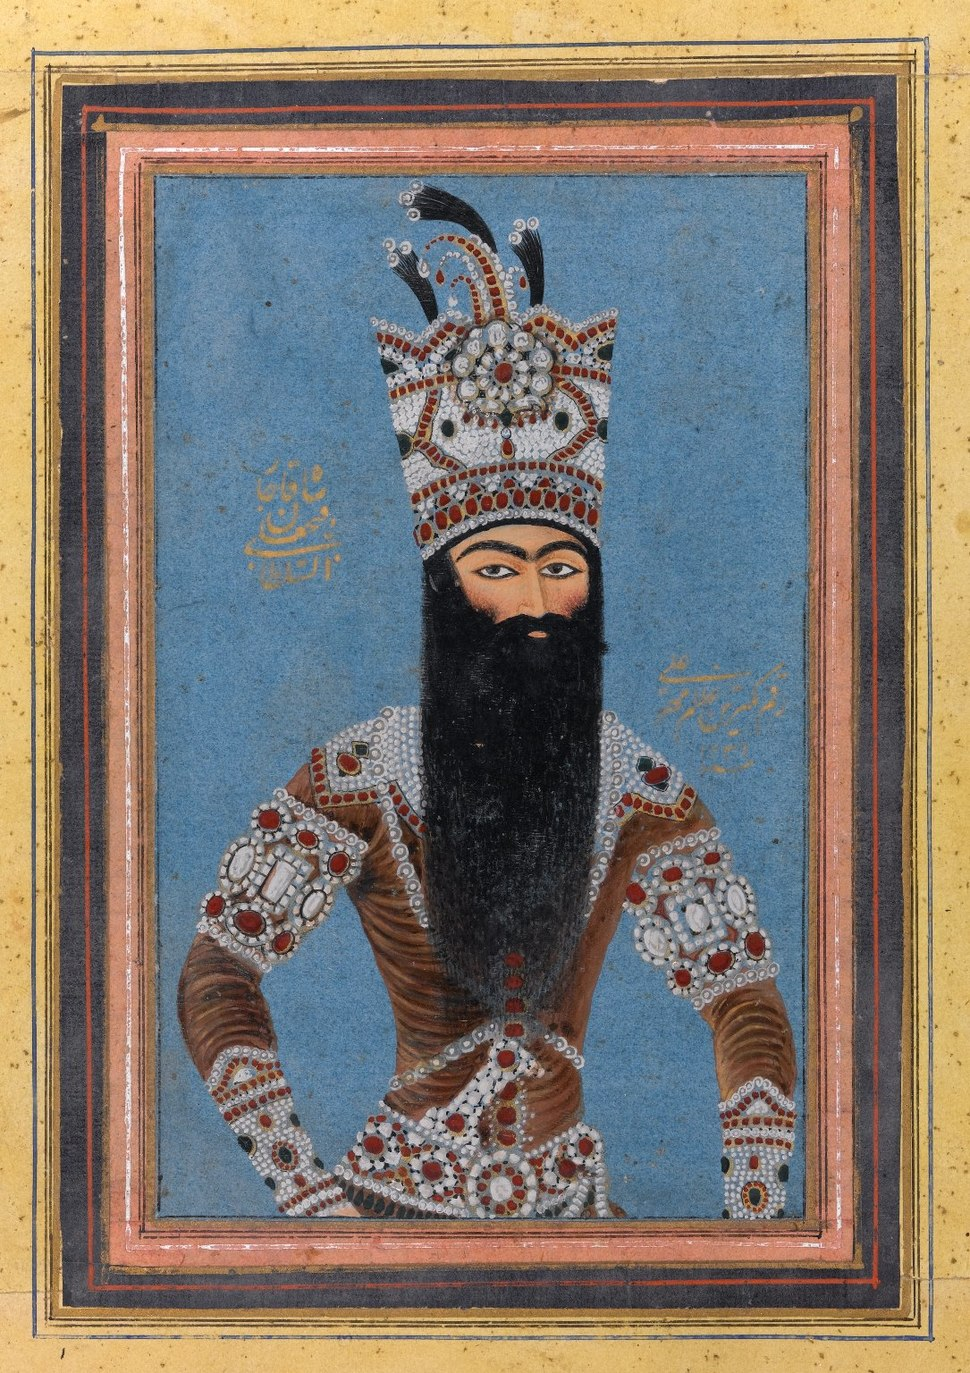 Mihr %27Ali (Iranian, active ca. 1800-1830). Portrait of Fath %27Ali Shah Qajar, 1815